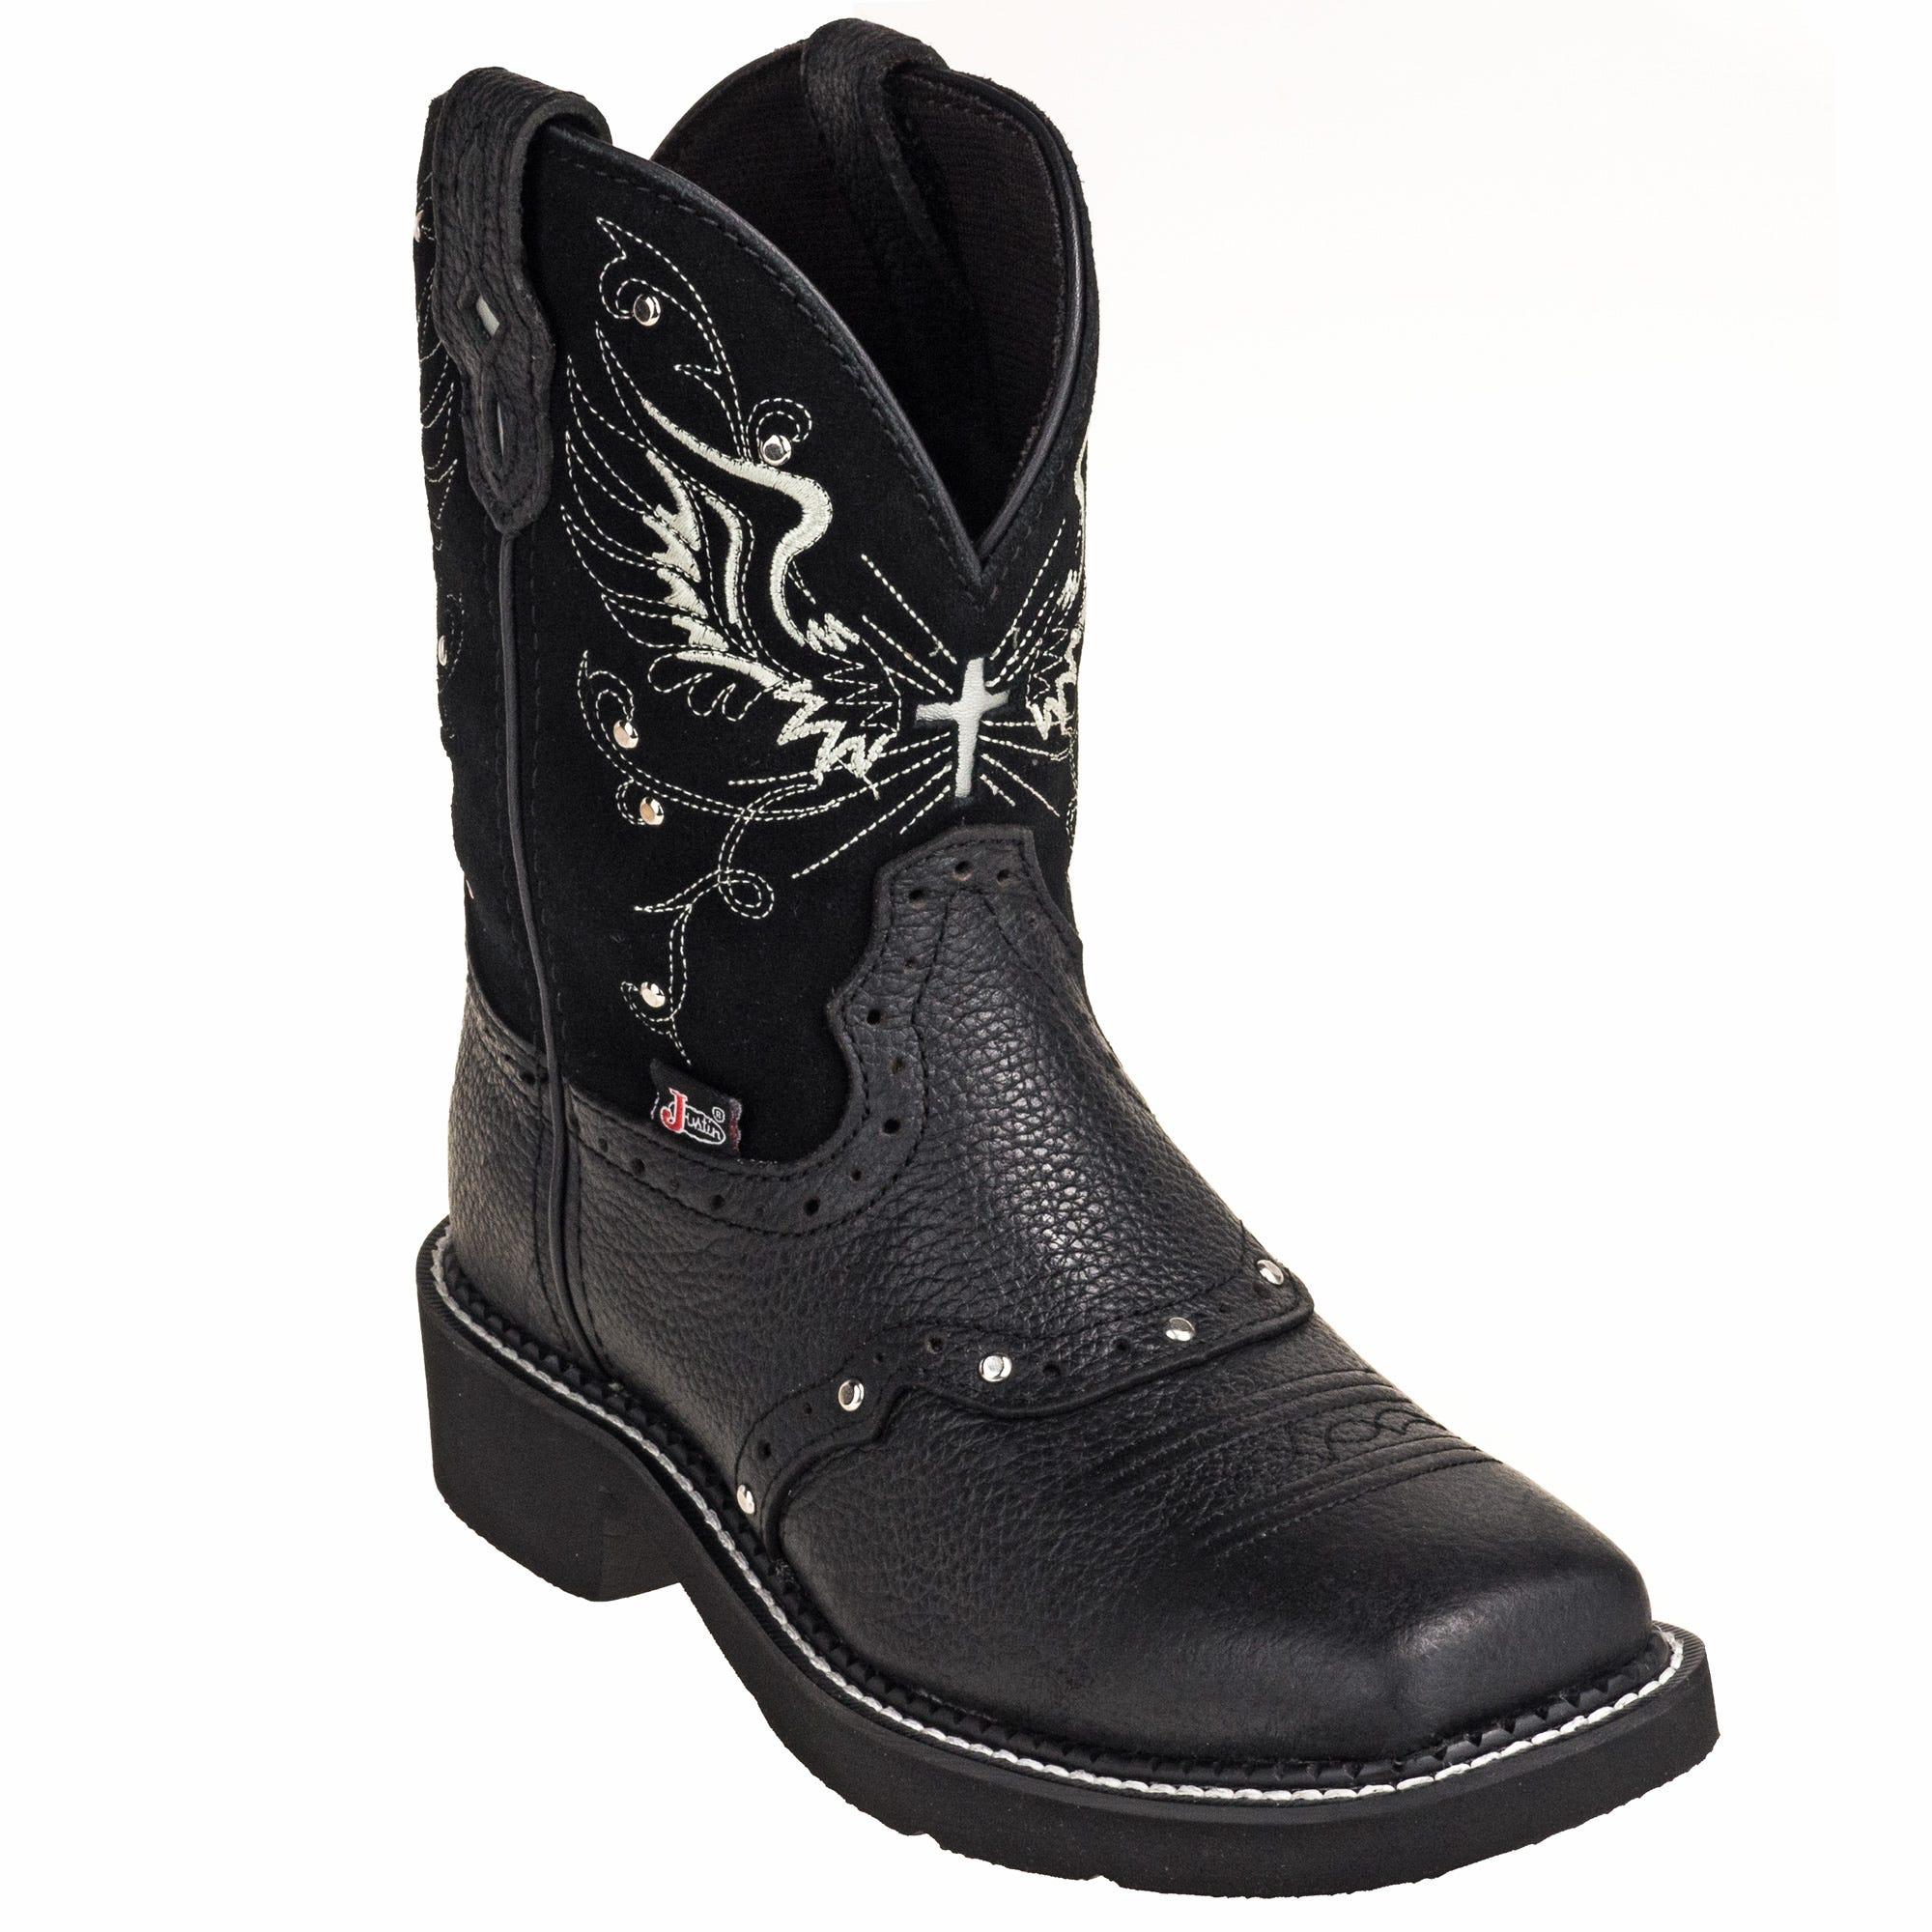 Justin Women's L9977 Black Rhinestone Mandra 8-Inch Cowboy Boots